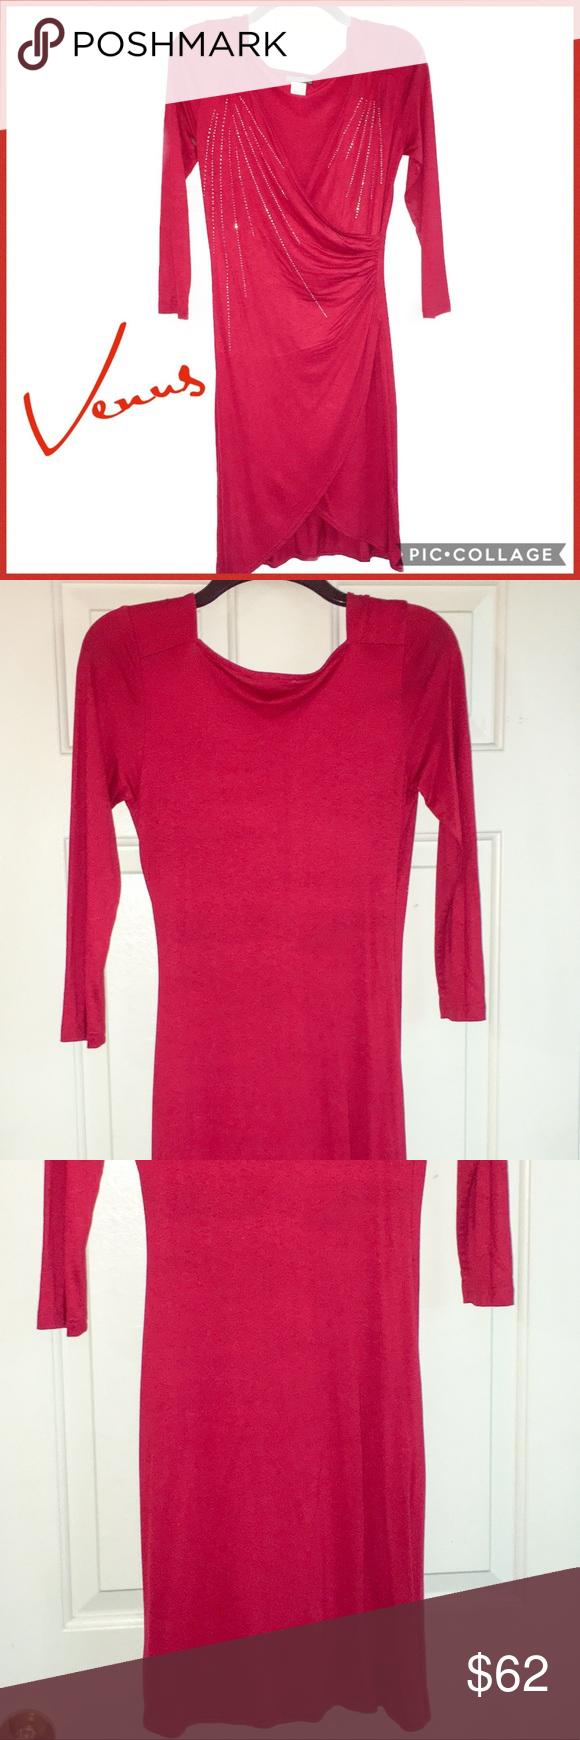 Venus red bodycon long sleeved wrap dress size xs shop my posh